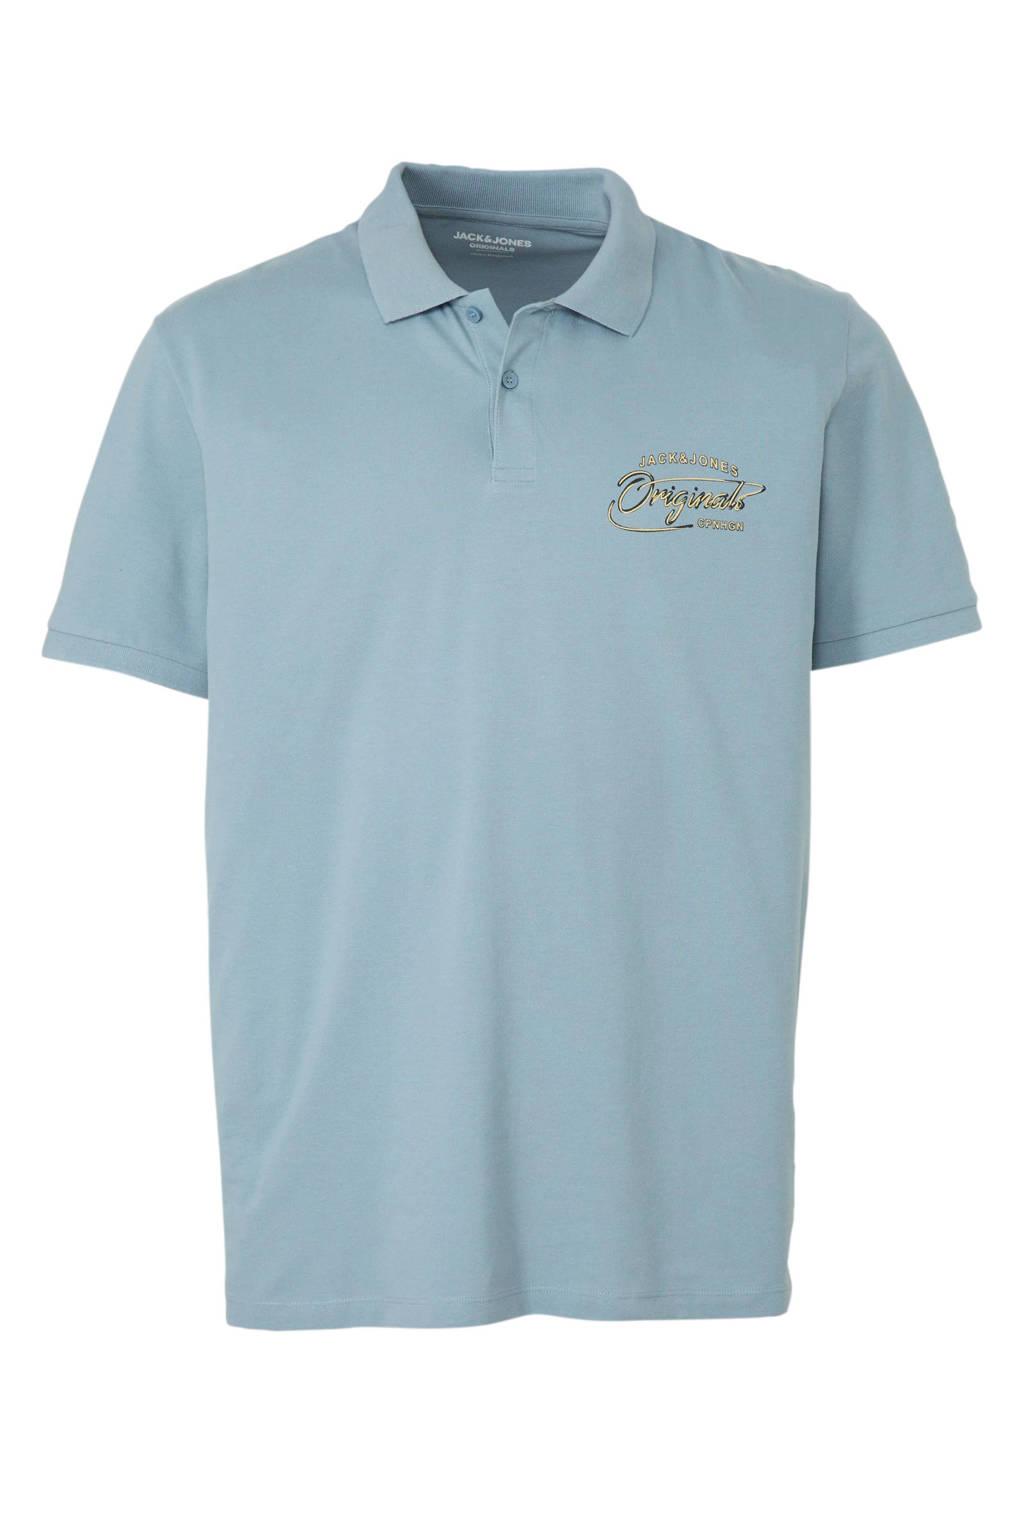 JACK & JONES PLUS SIZE regular fit polo met logo lichtblauw, Lichtblauw